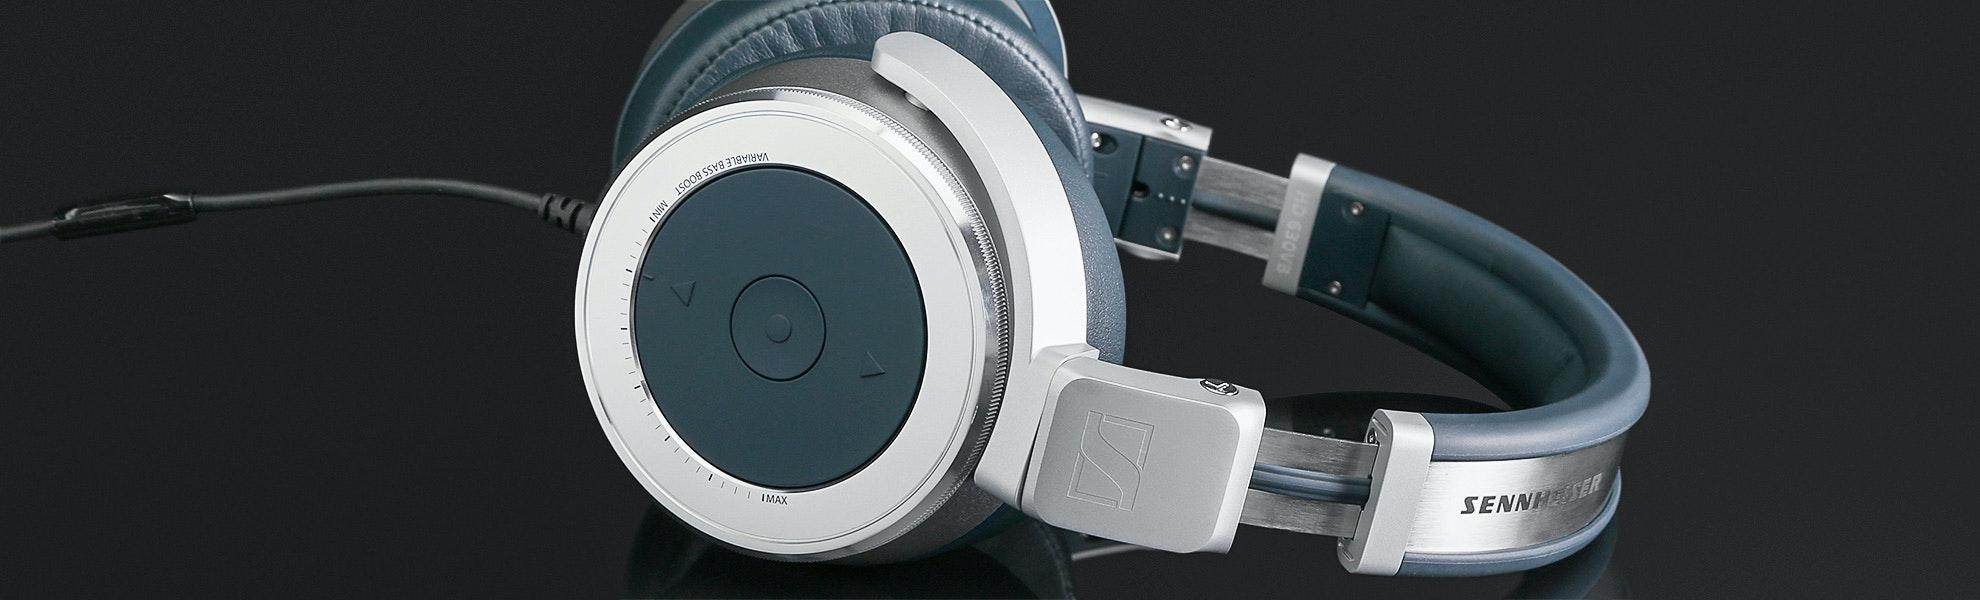 Sennheiser HD 630VB Headphones